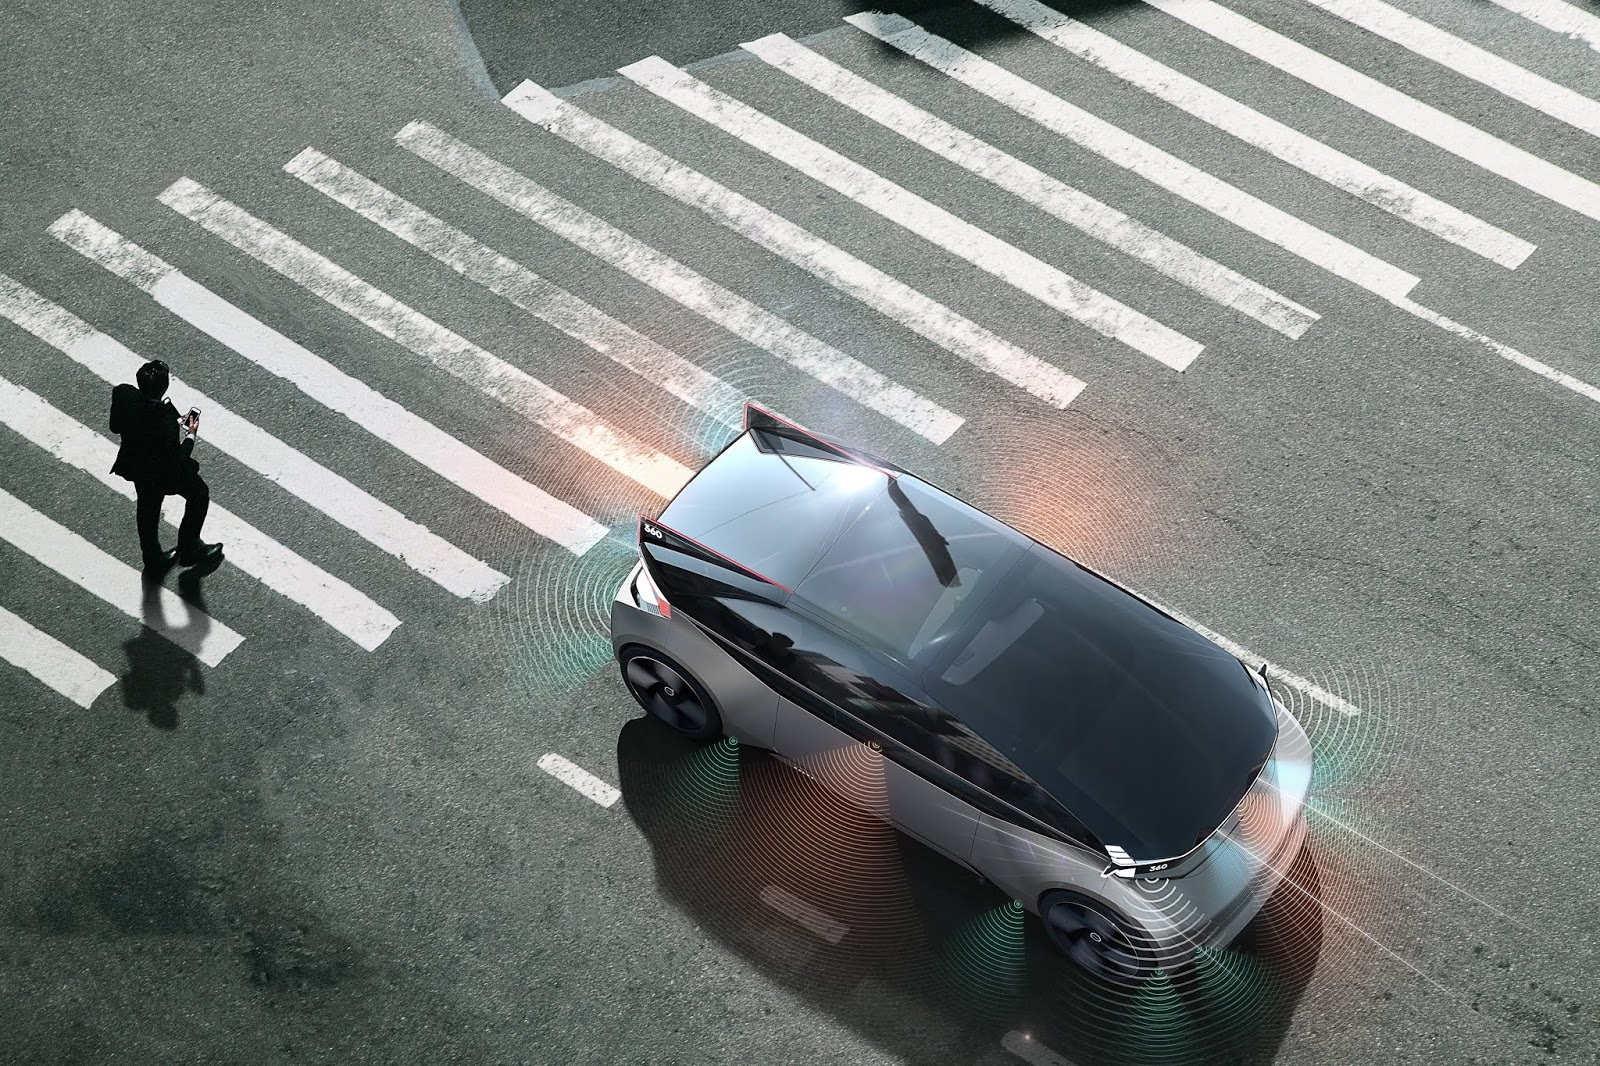 237066 Volvo 360c Exterior Safety 1 Το όραμα της Volvo χωρίς... τιμόνι Electric cars, Volvo, αυτόνομα, Αυτόνομη οδήγηση, Τεχνολογία